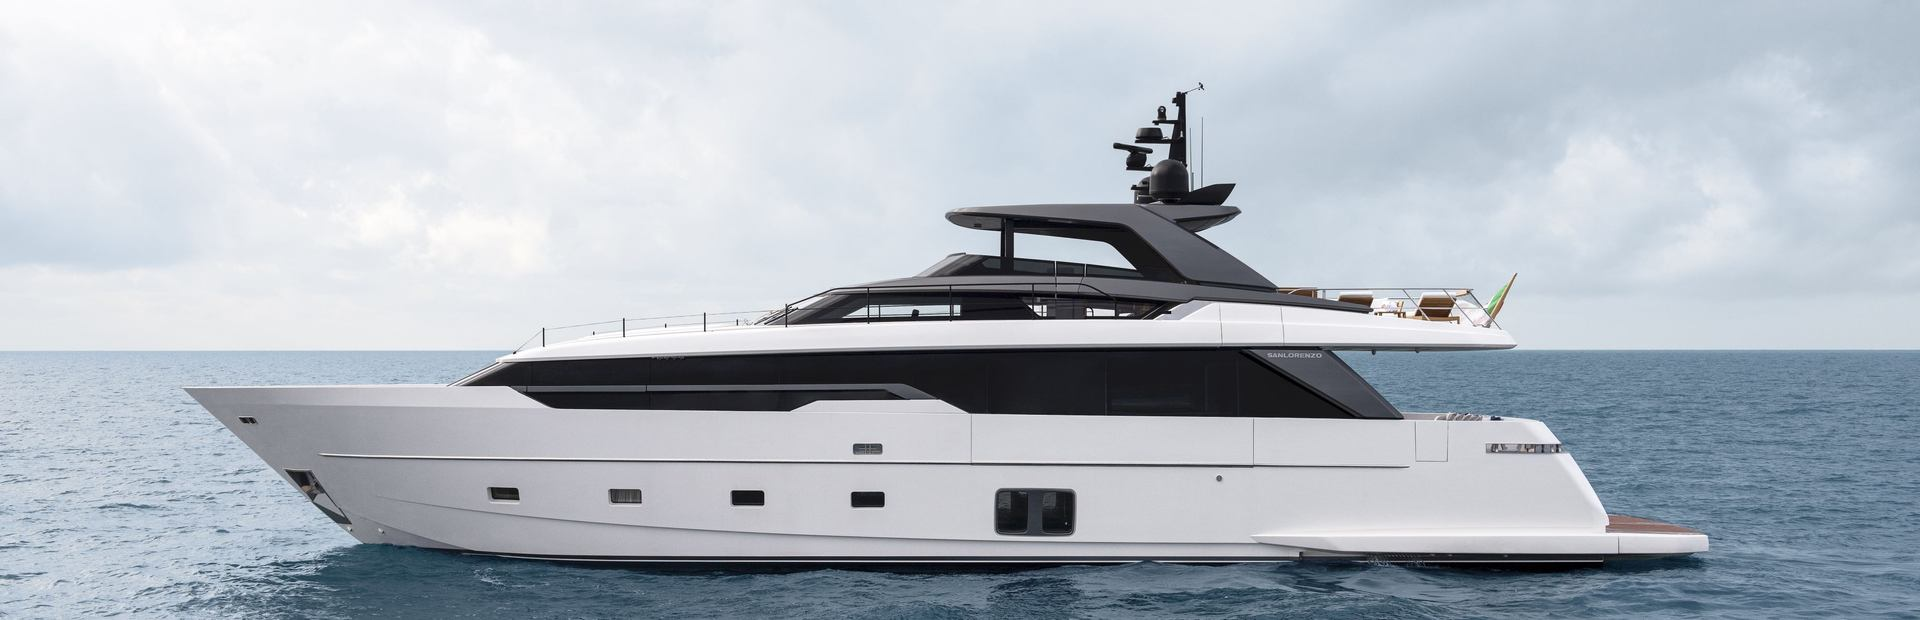 SL96 Asymmetric Yacht Charter